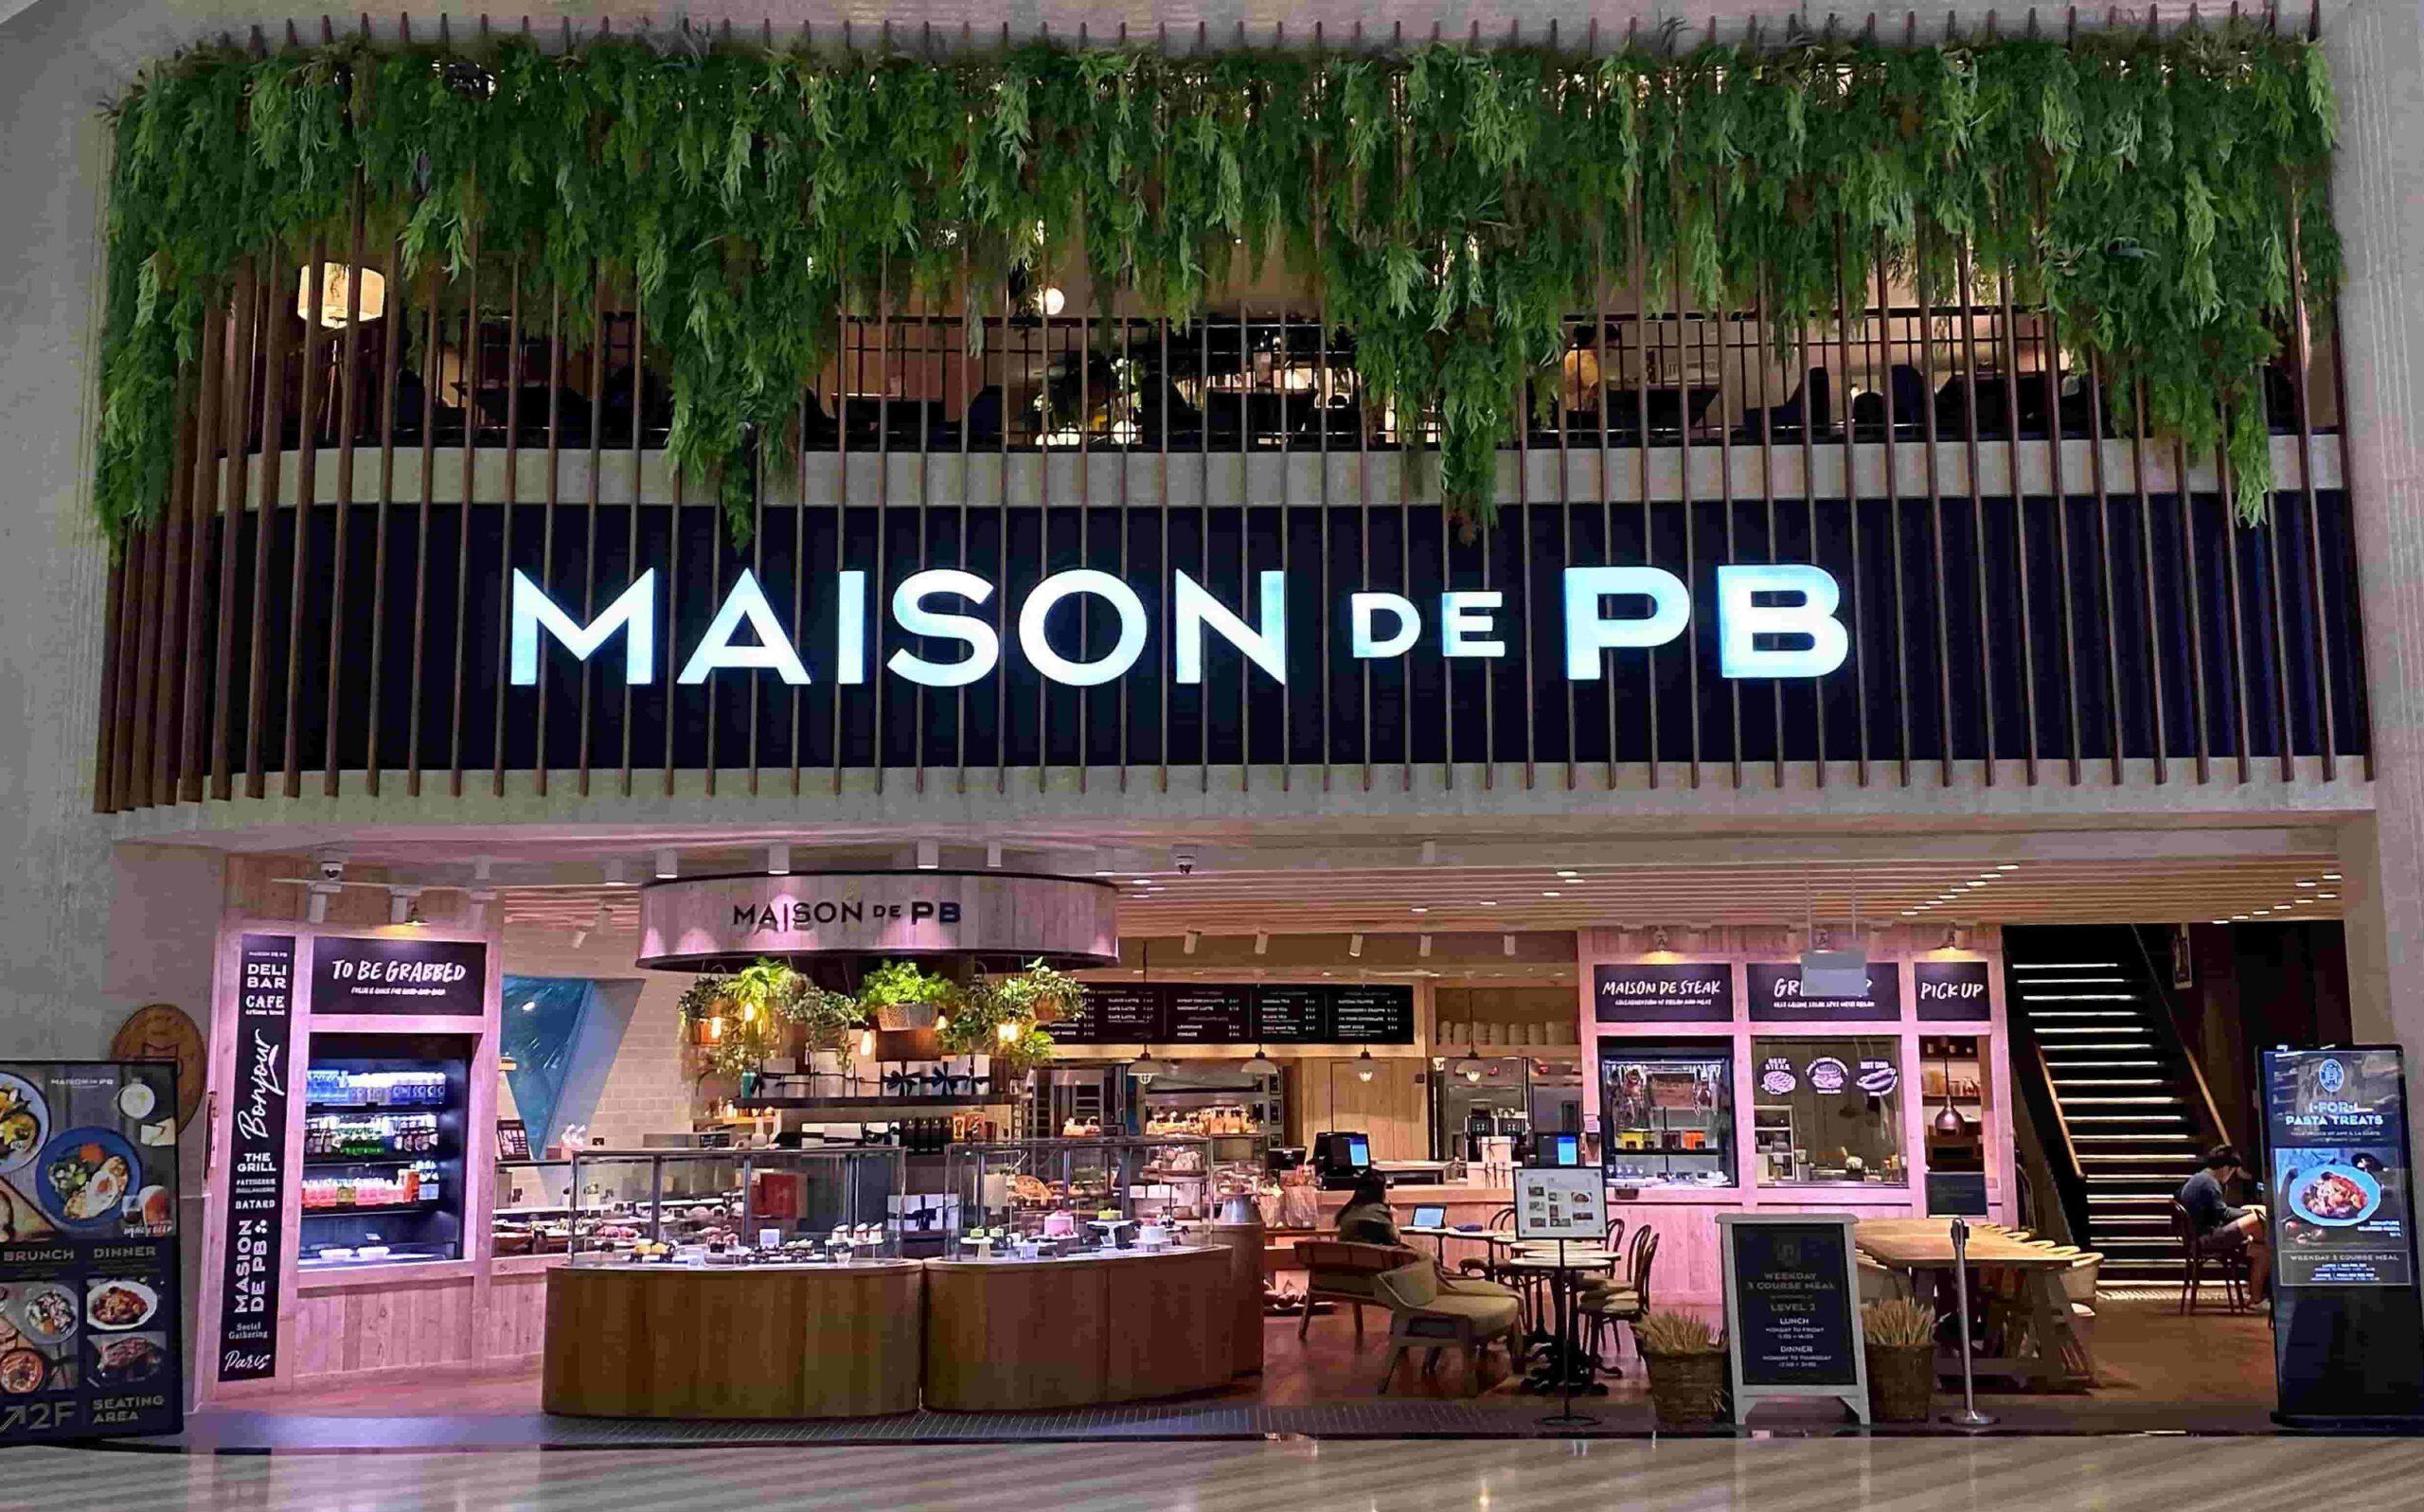 1-for-1 royal pudding - maison de pb